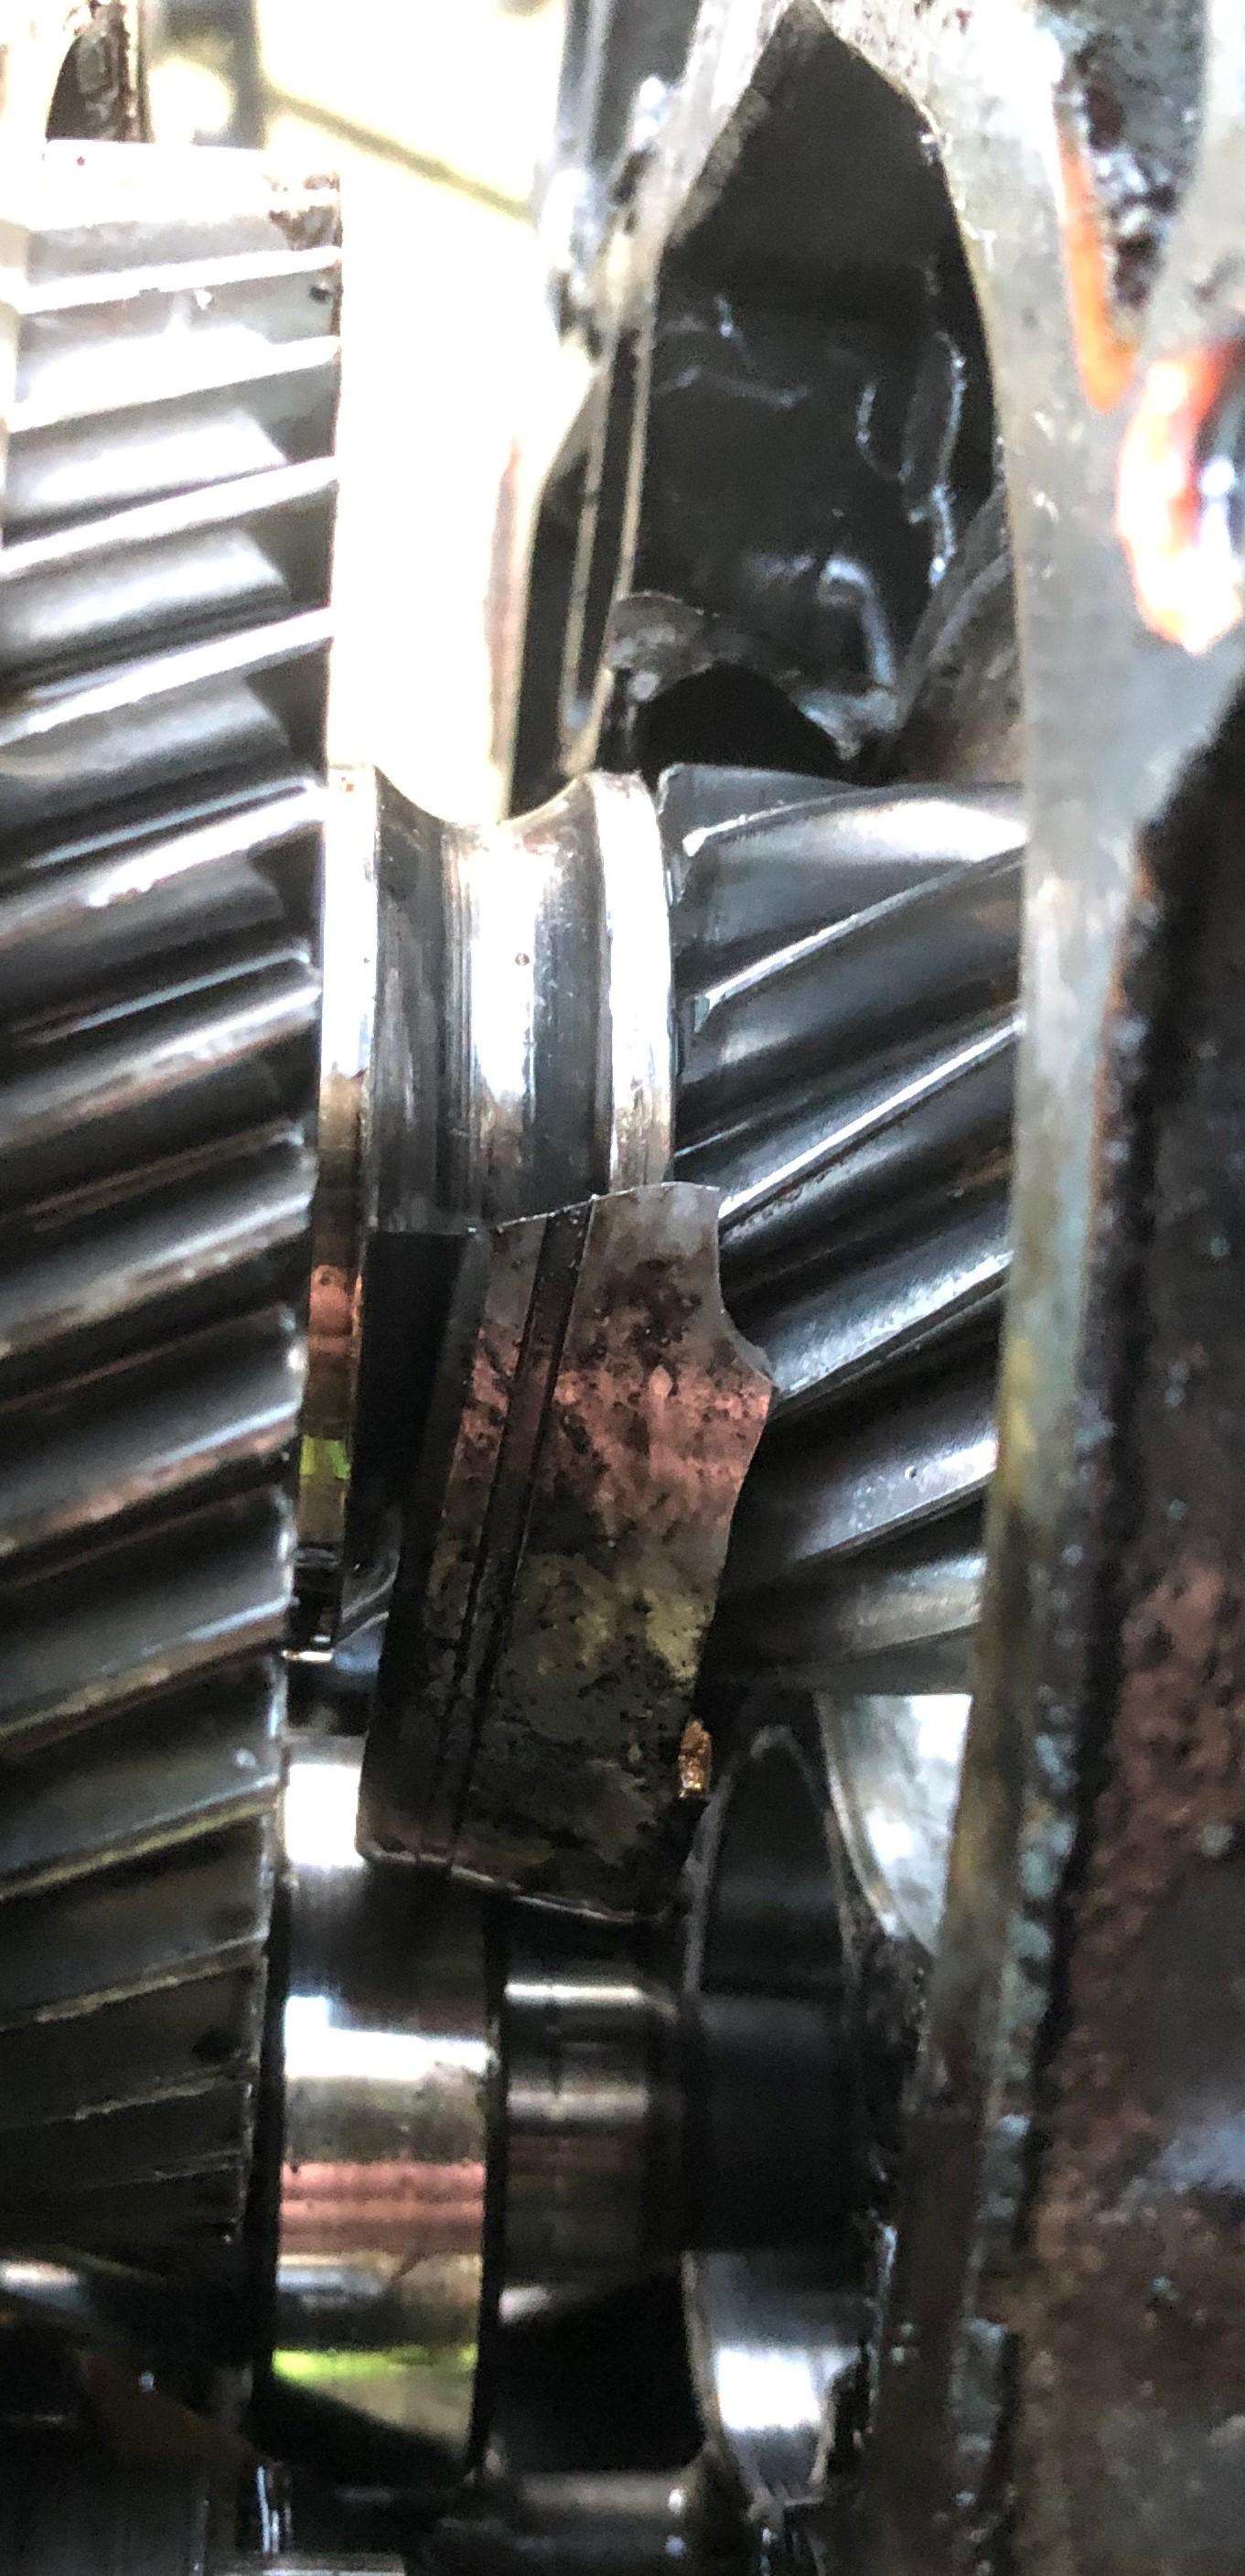 Click image for larger version  Name:Main shaft bearing 2.jpg Views:14 Size:767.4 KB ID:195792